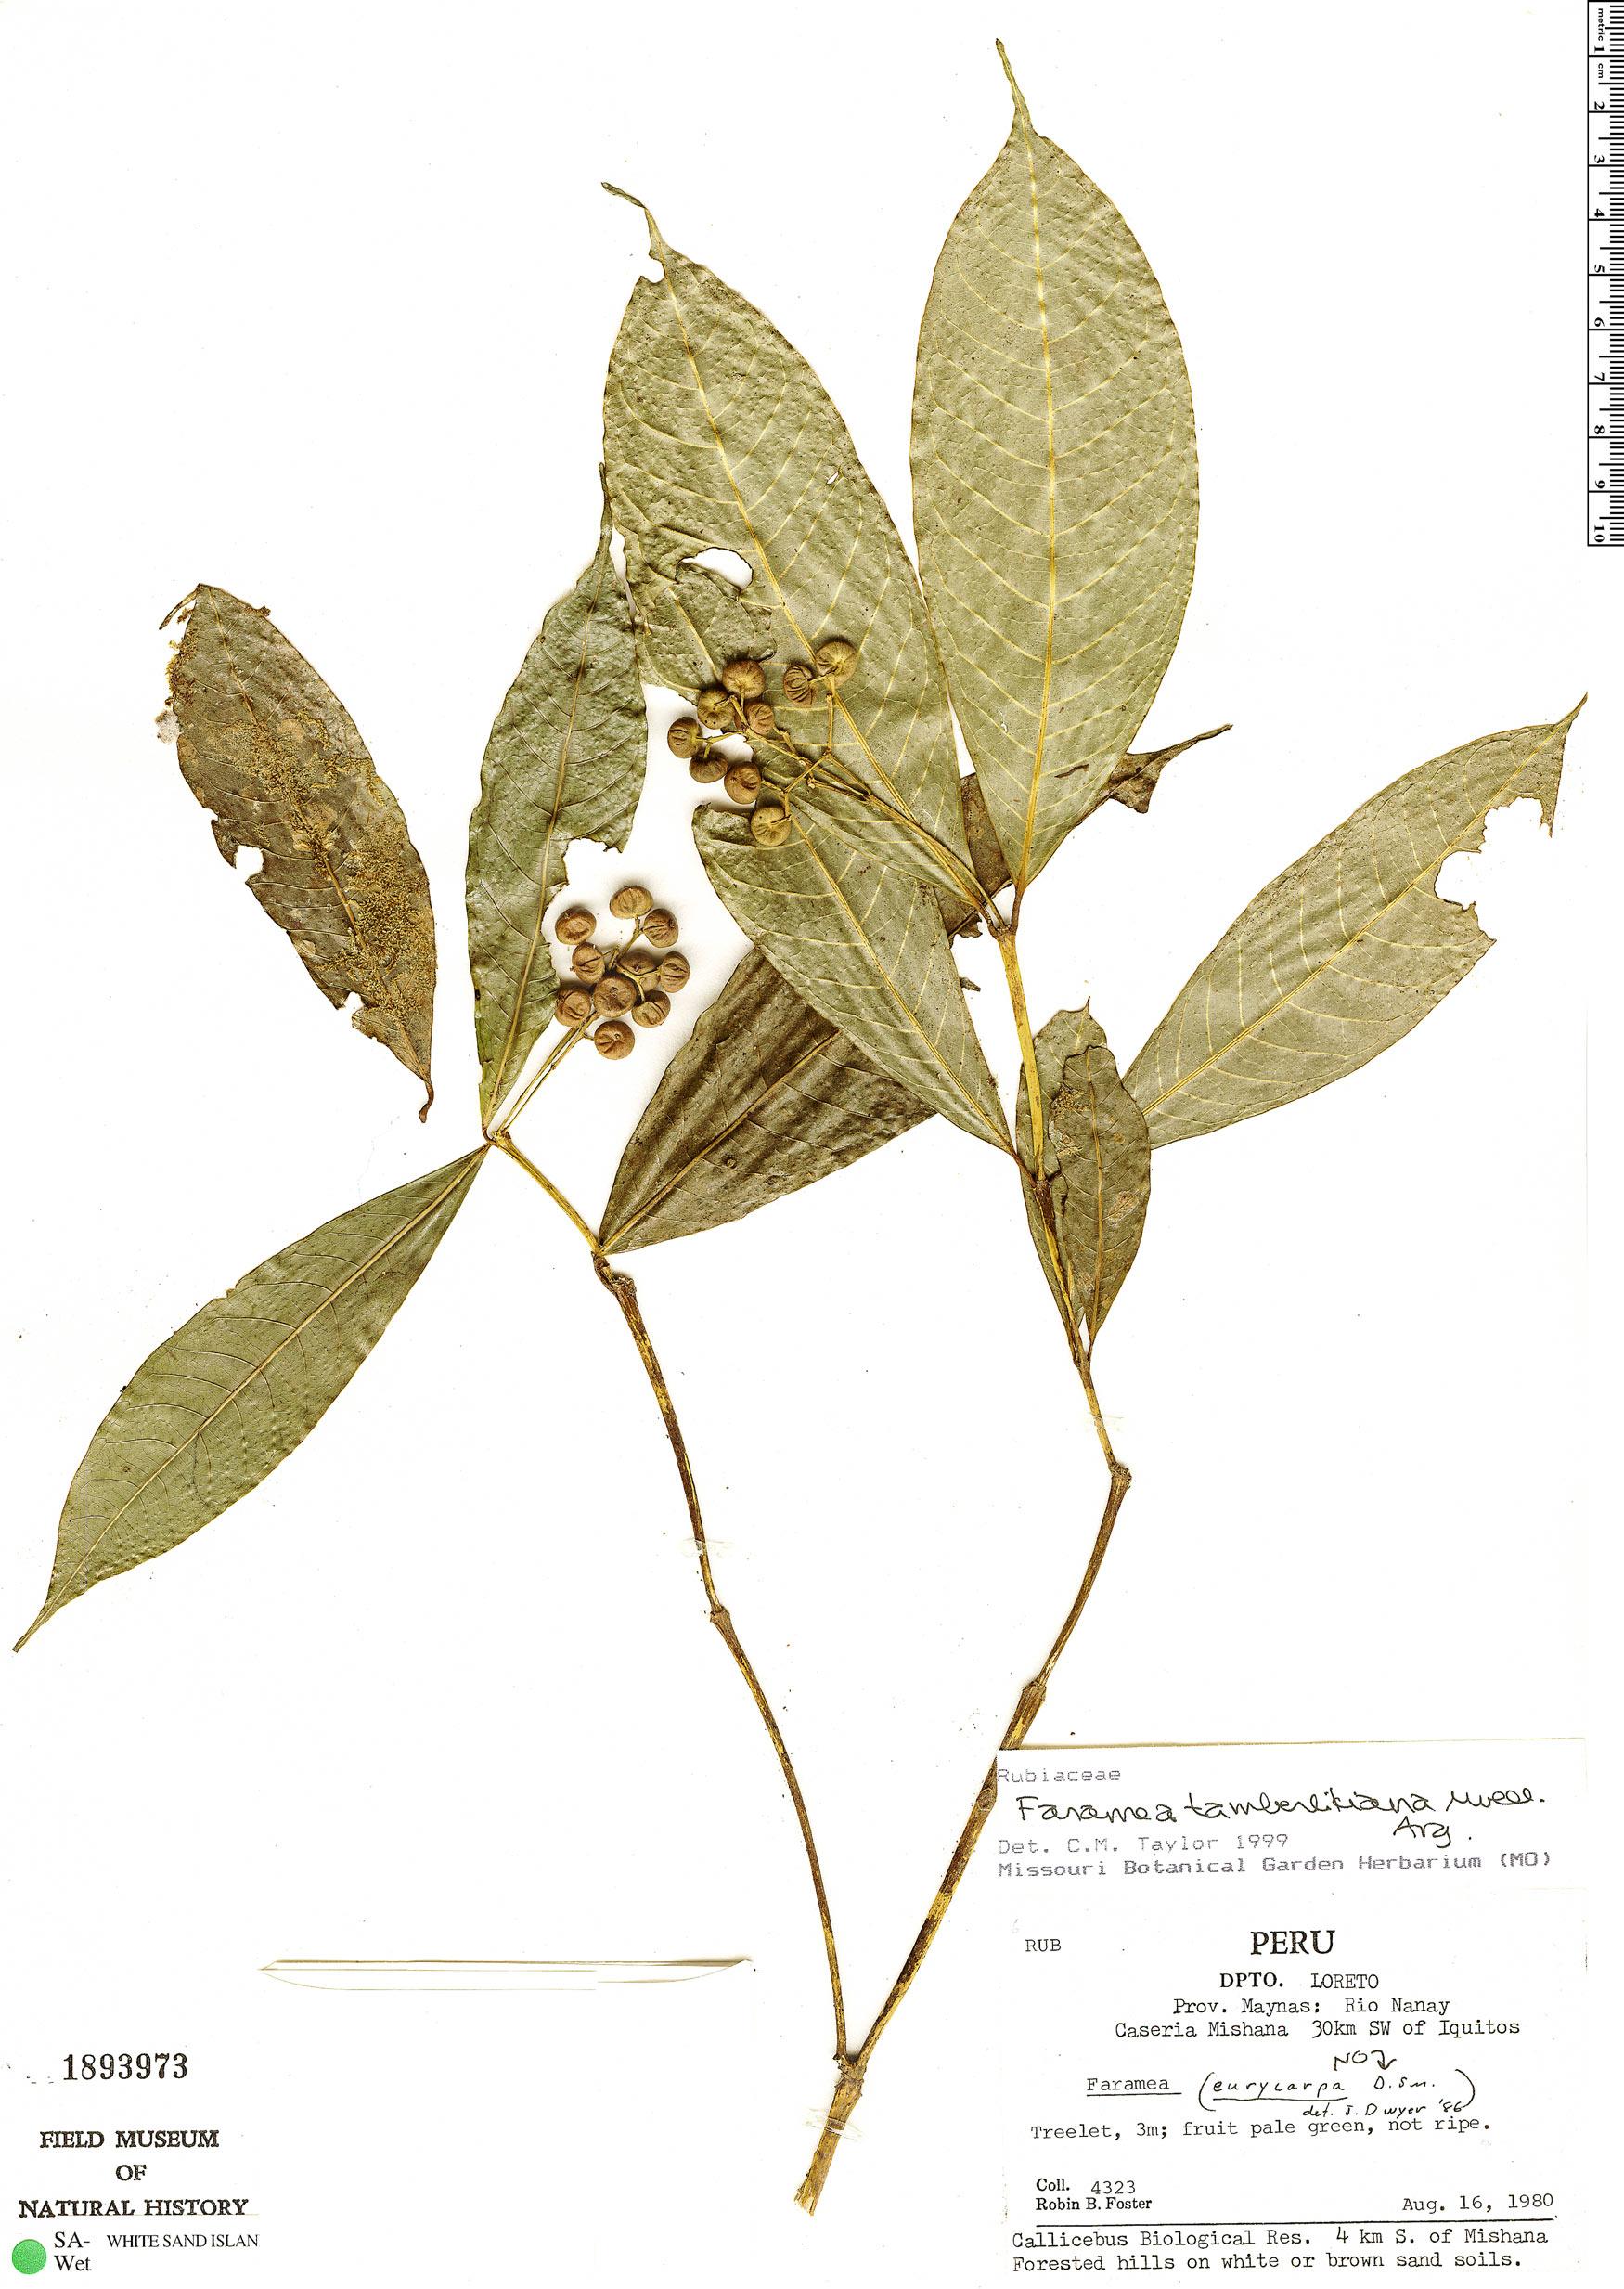 Specimen: Faramea tamberlikiana